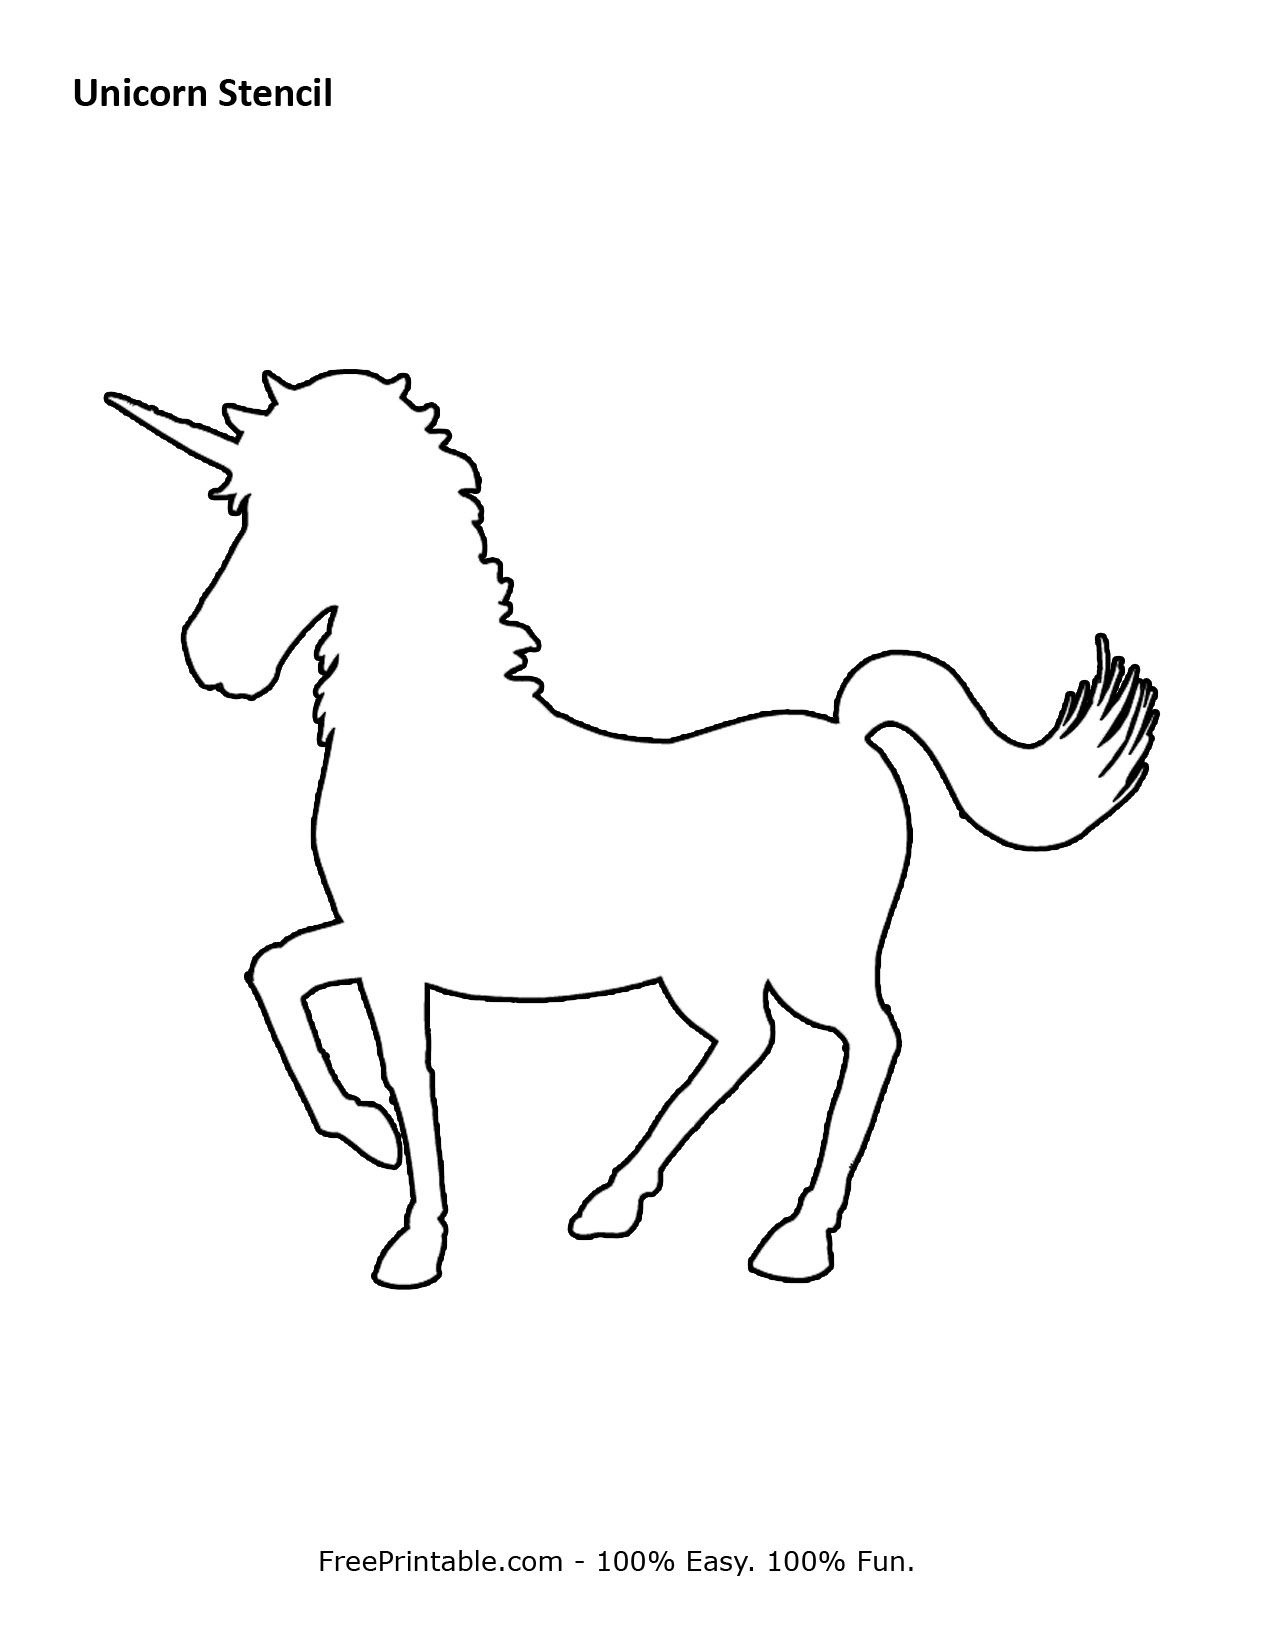 Free Printable Unicorn Stencils   Crafts & Sewing   Unicorn Stencil - Free Printable Unicorn Template